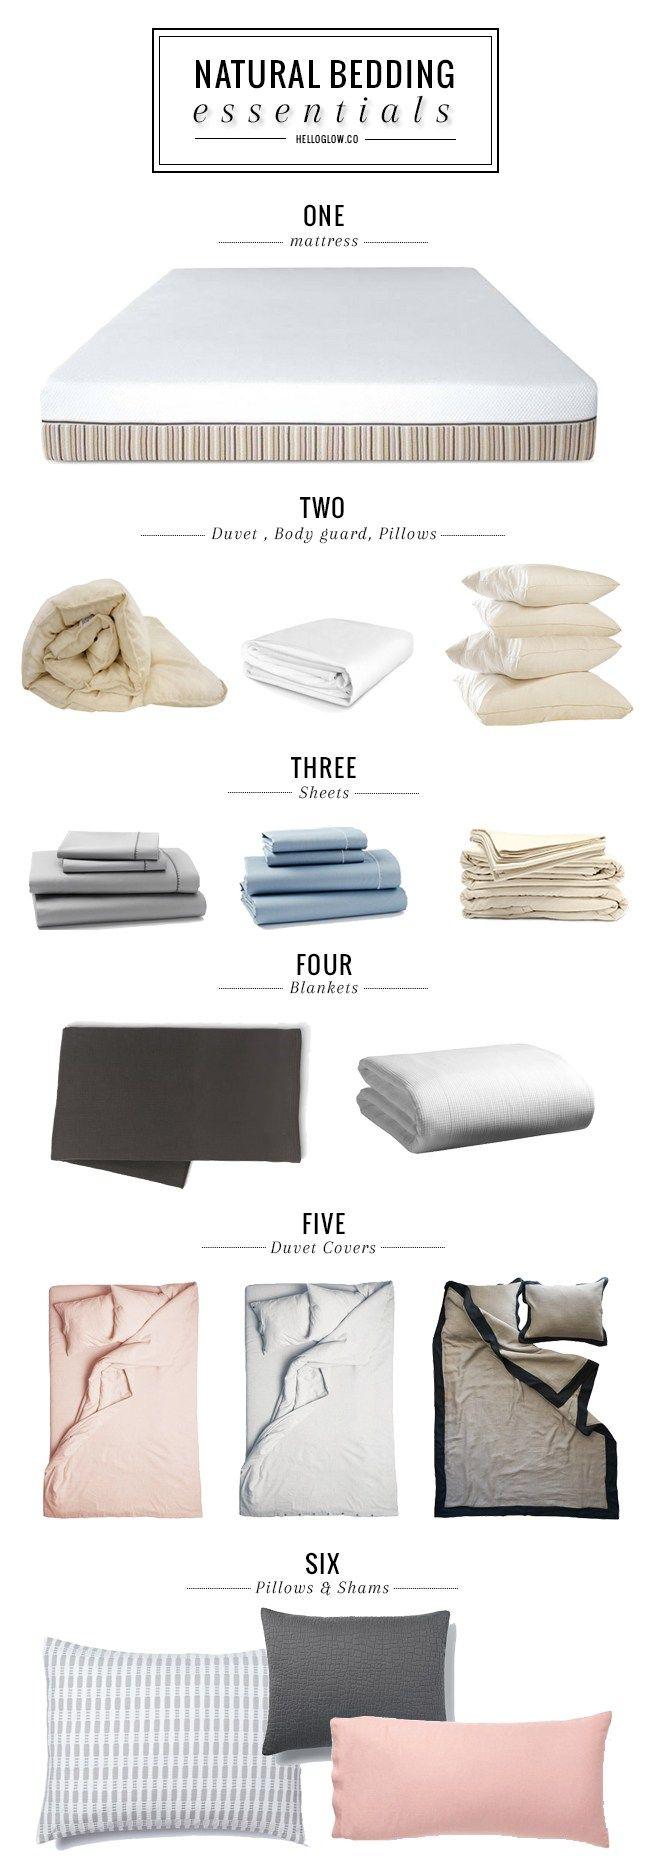 Natural Bedding Essentials